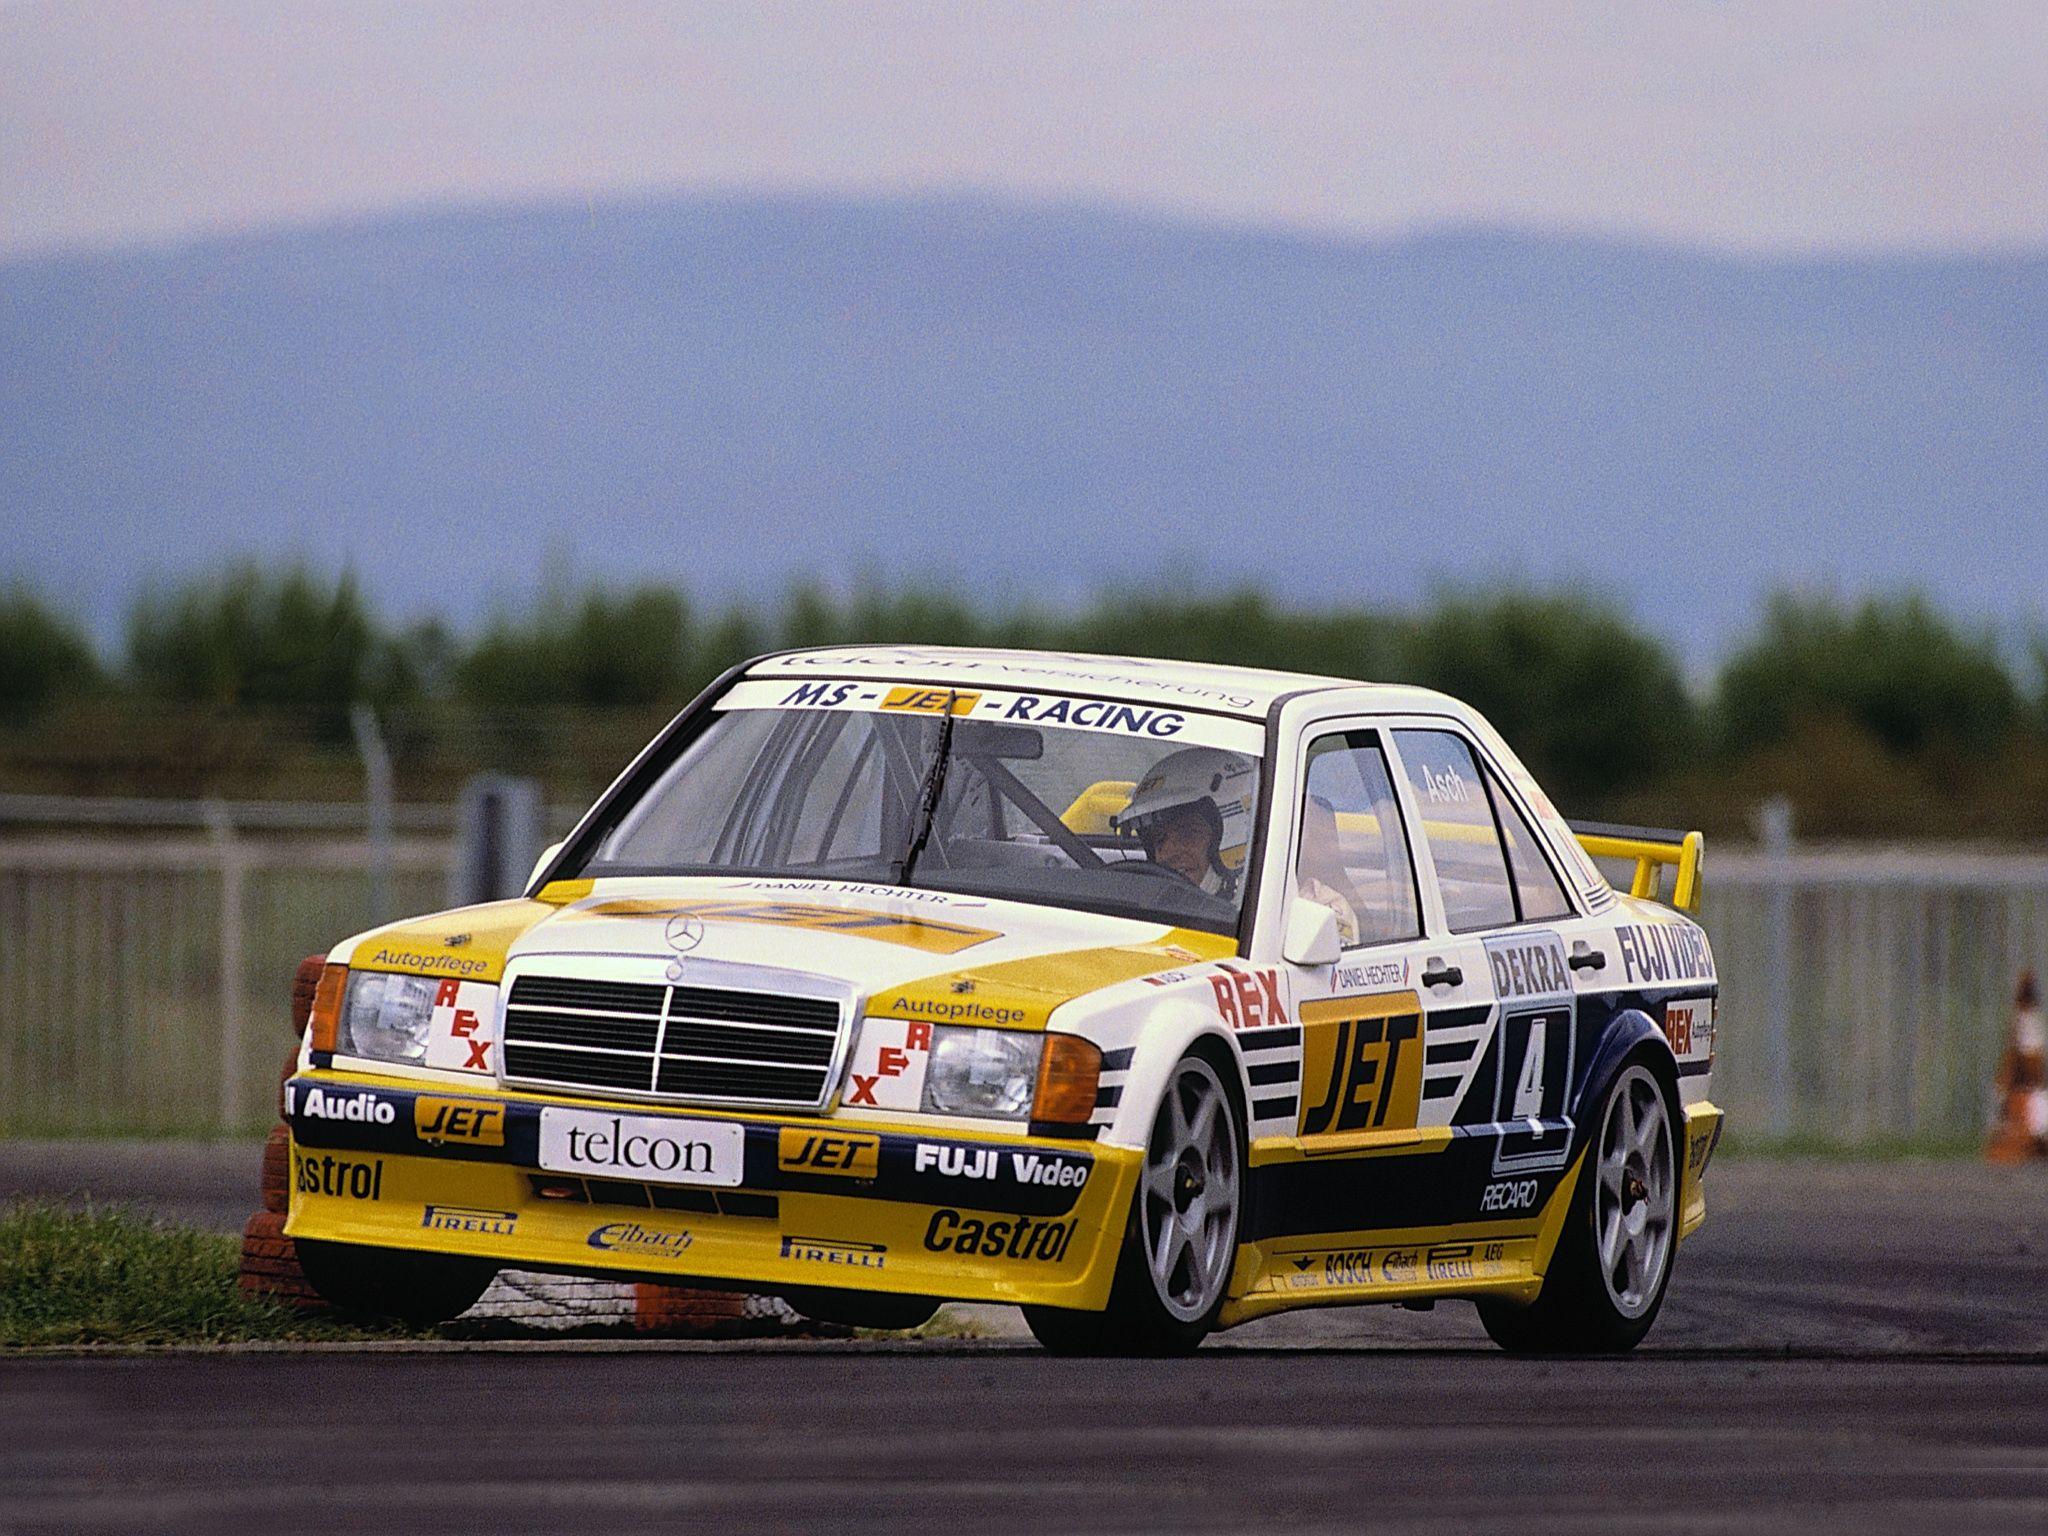 1989 Mercedes-Benz 190 E 2.5L 16V Evolution W201 DTM race racing ...